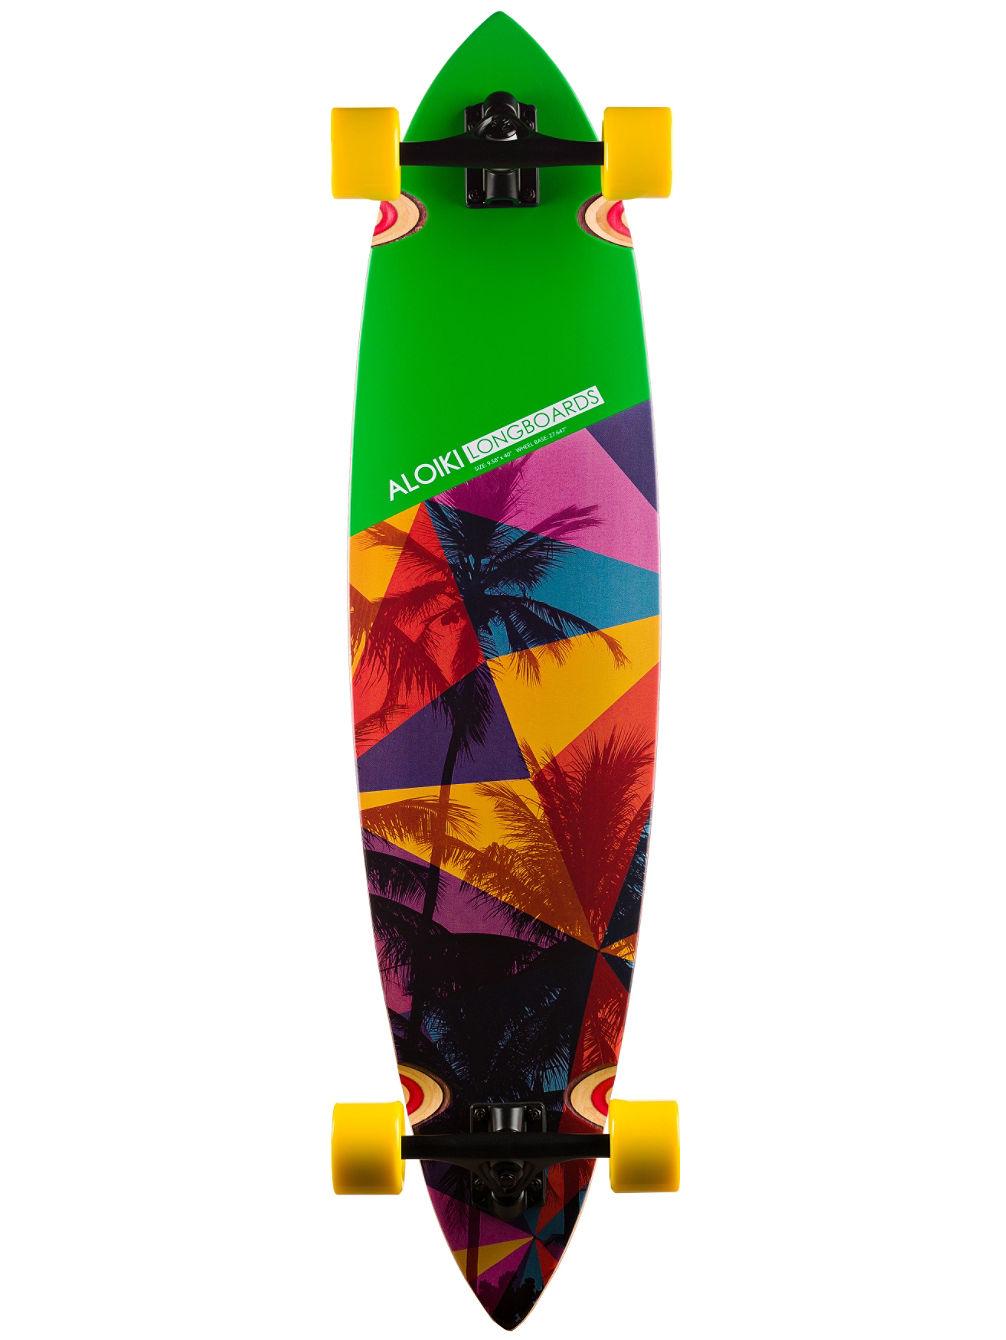 aloiki-longboards-komodo-pintail-96-x-40-complete